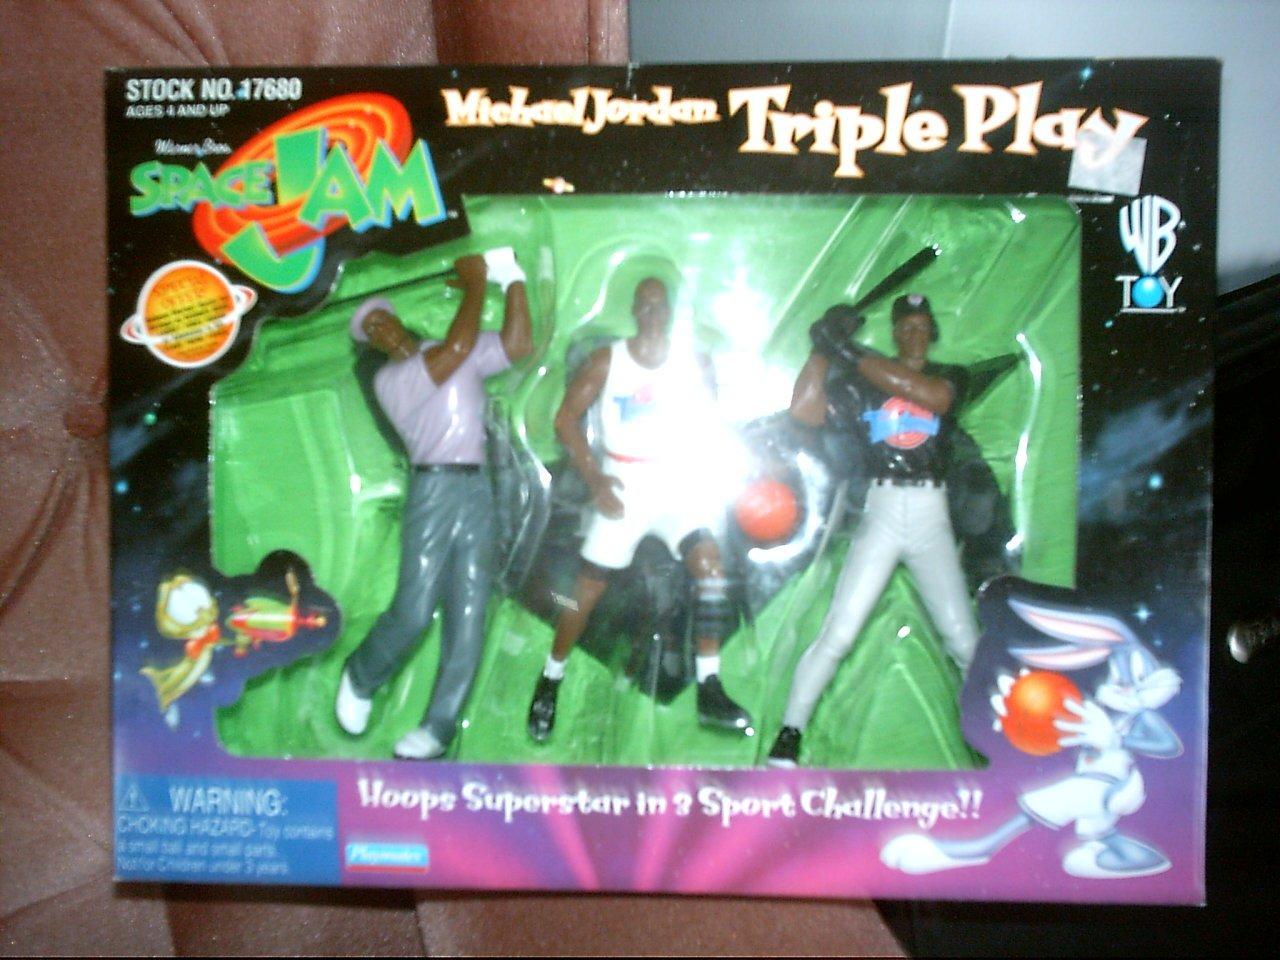 1996 Micheal Jordan Triple Play Space Jam Action Figures